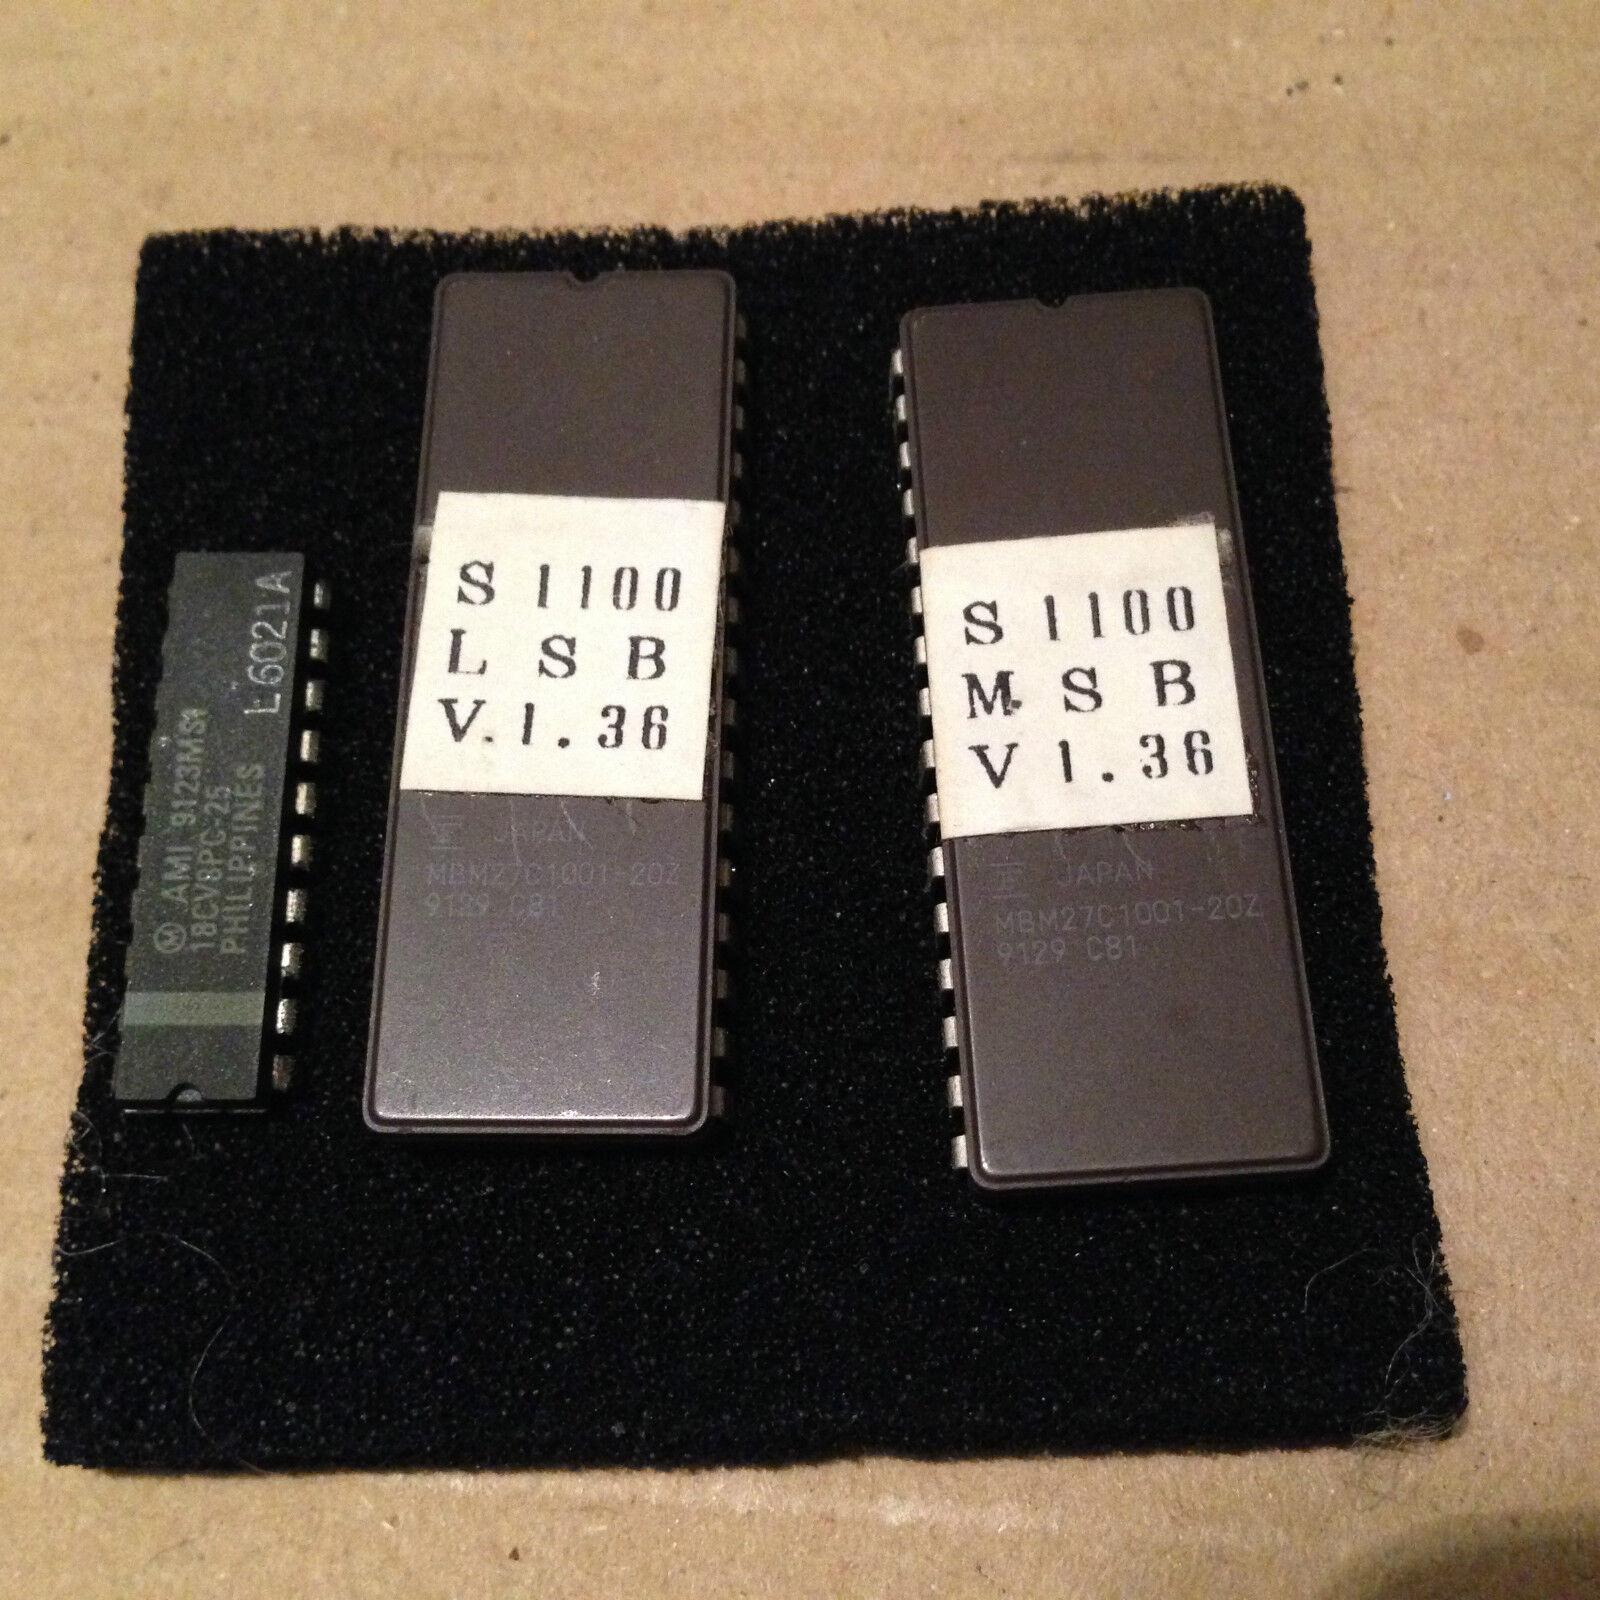 AKAI S1100 - SYSTEM V1.36  - EPROM - CAMPIONATORE, sampling